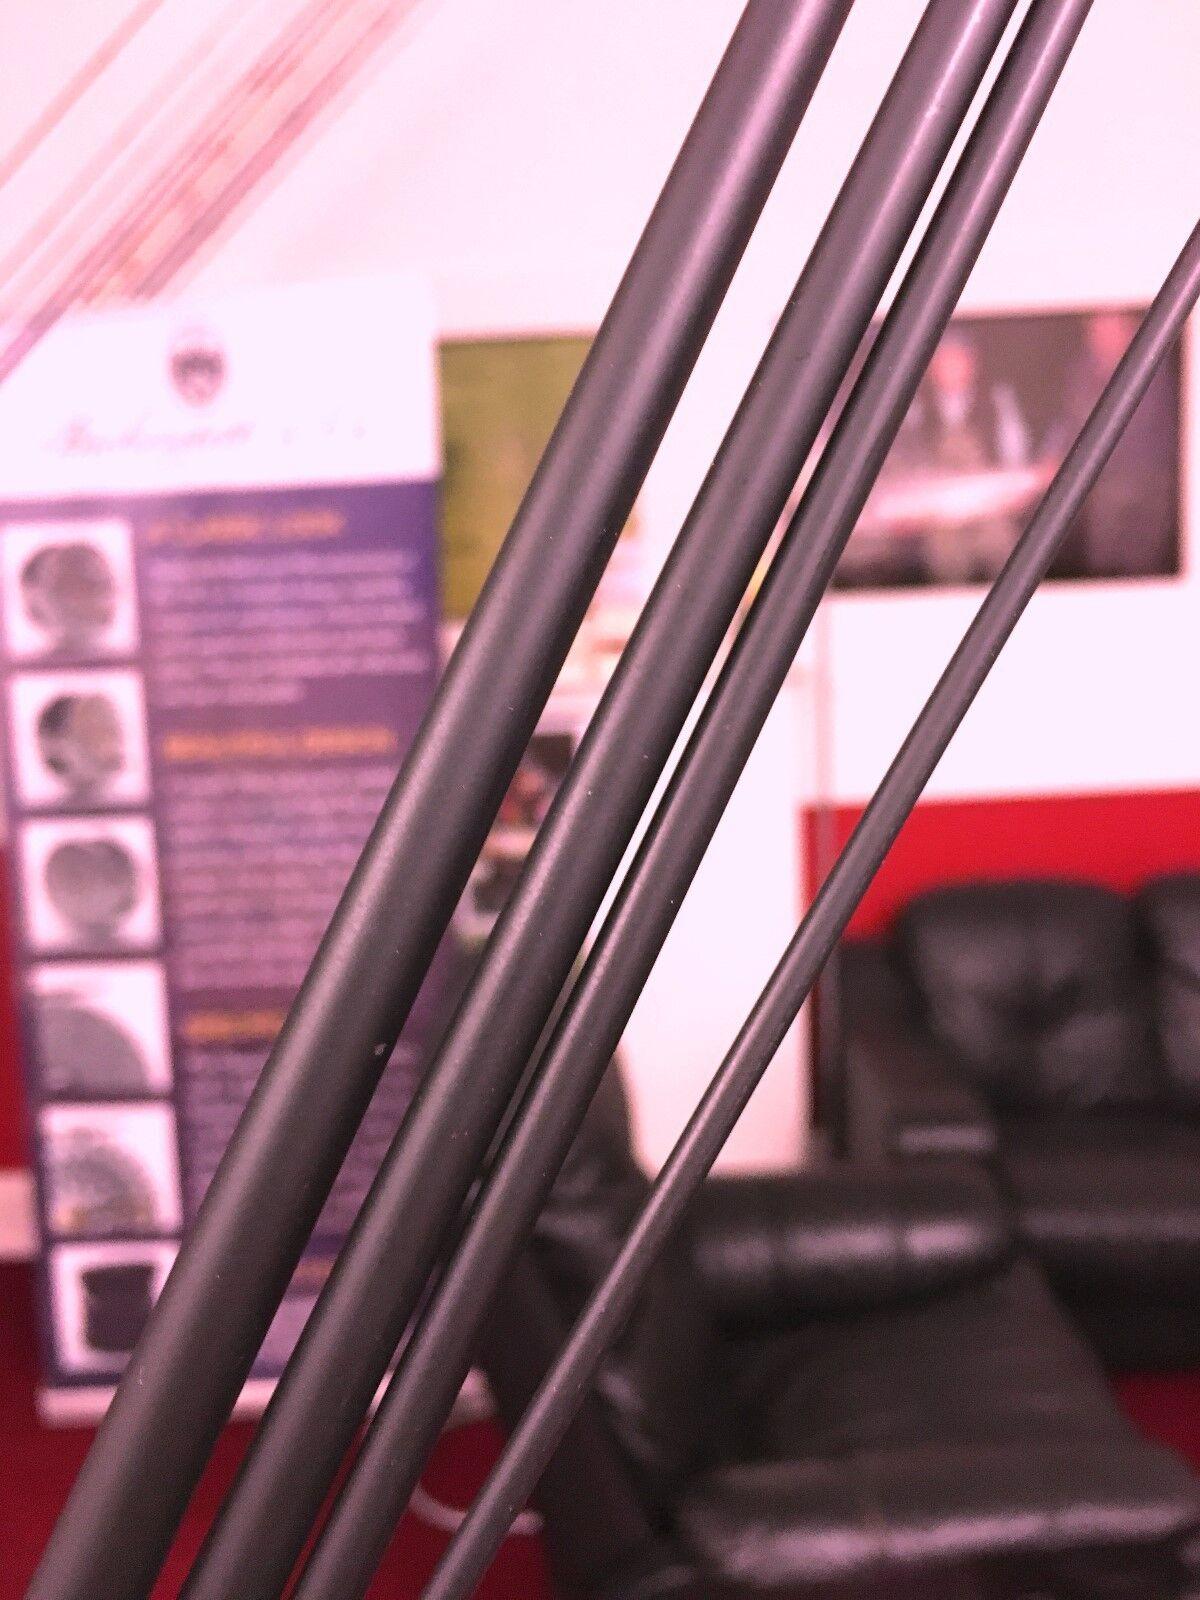 Bloke XL50  Switch  rod blank 11' 6wt 4-piece